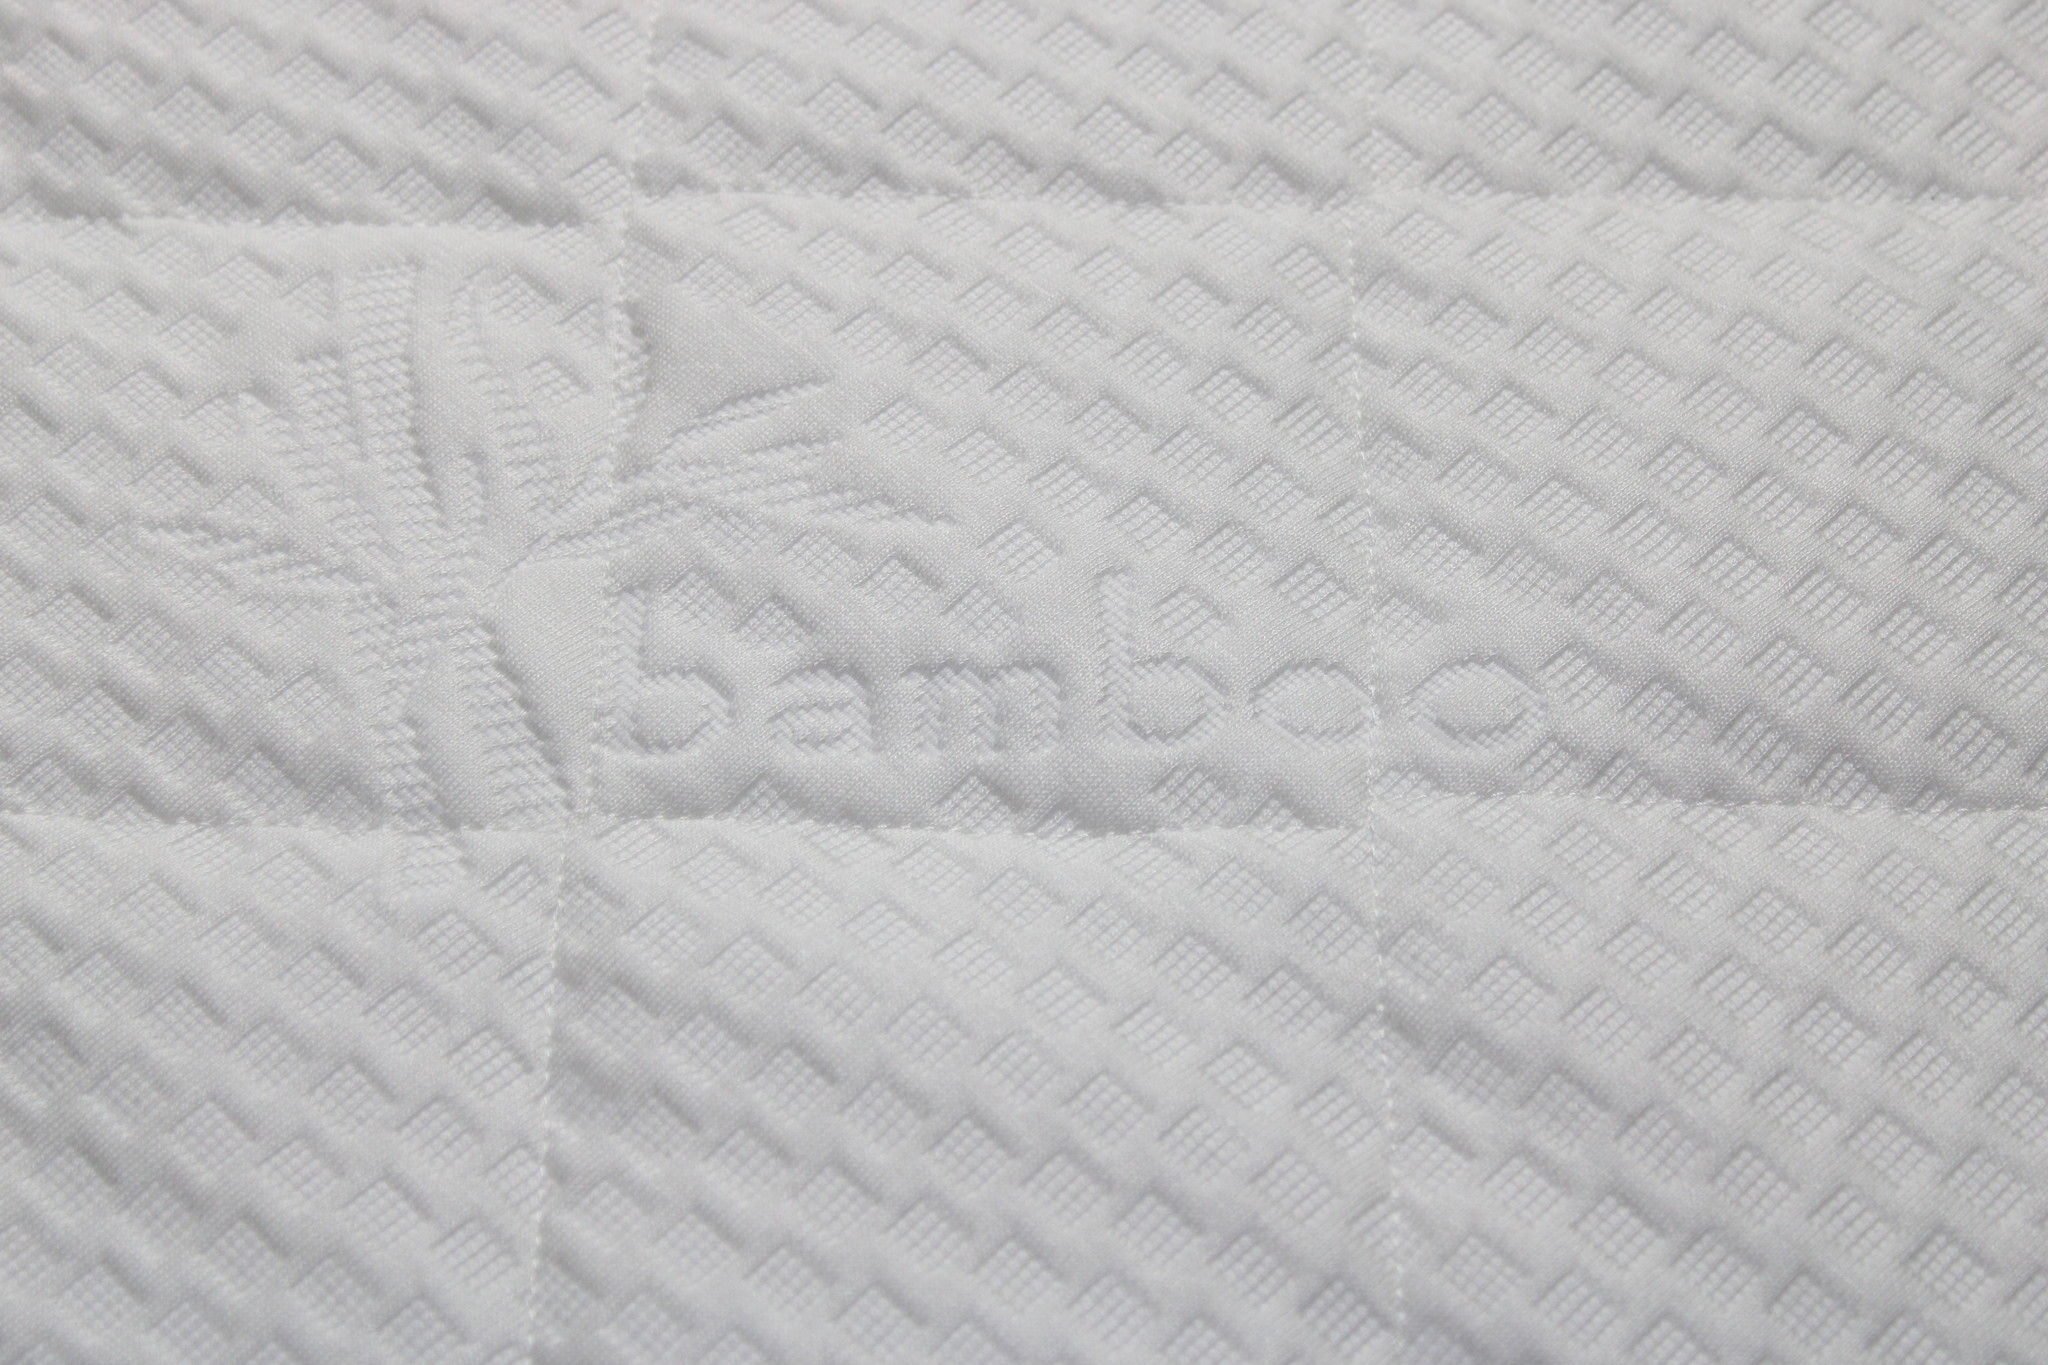 Sarpy Kindermatras 90x140 koudschuim hr40 bamboo